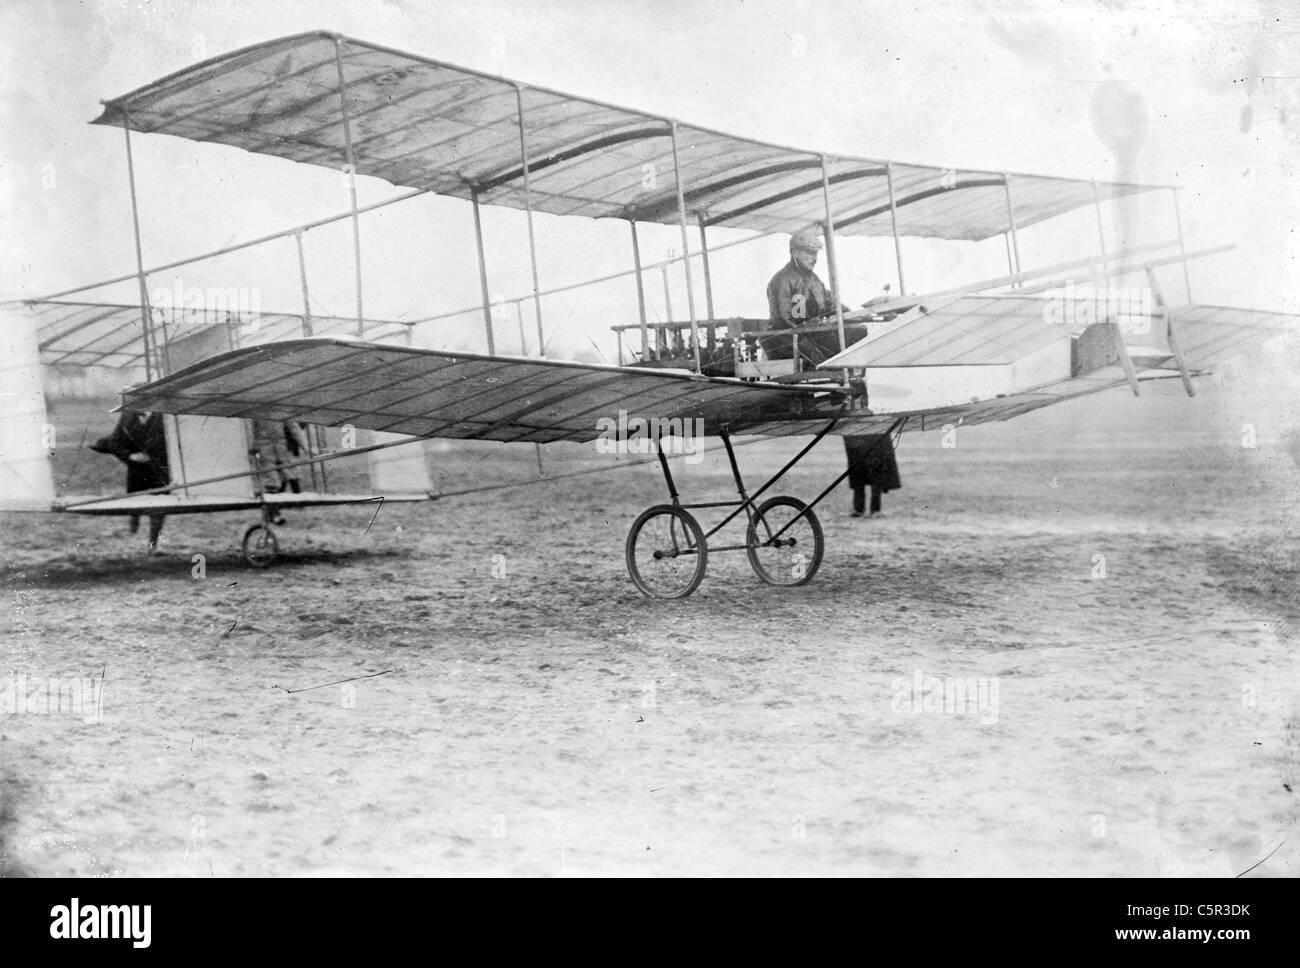 Delagrange in his aeroplane, Leon Delagrange - Stock Image